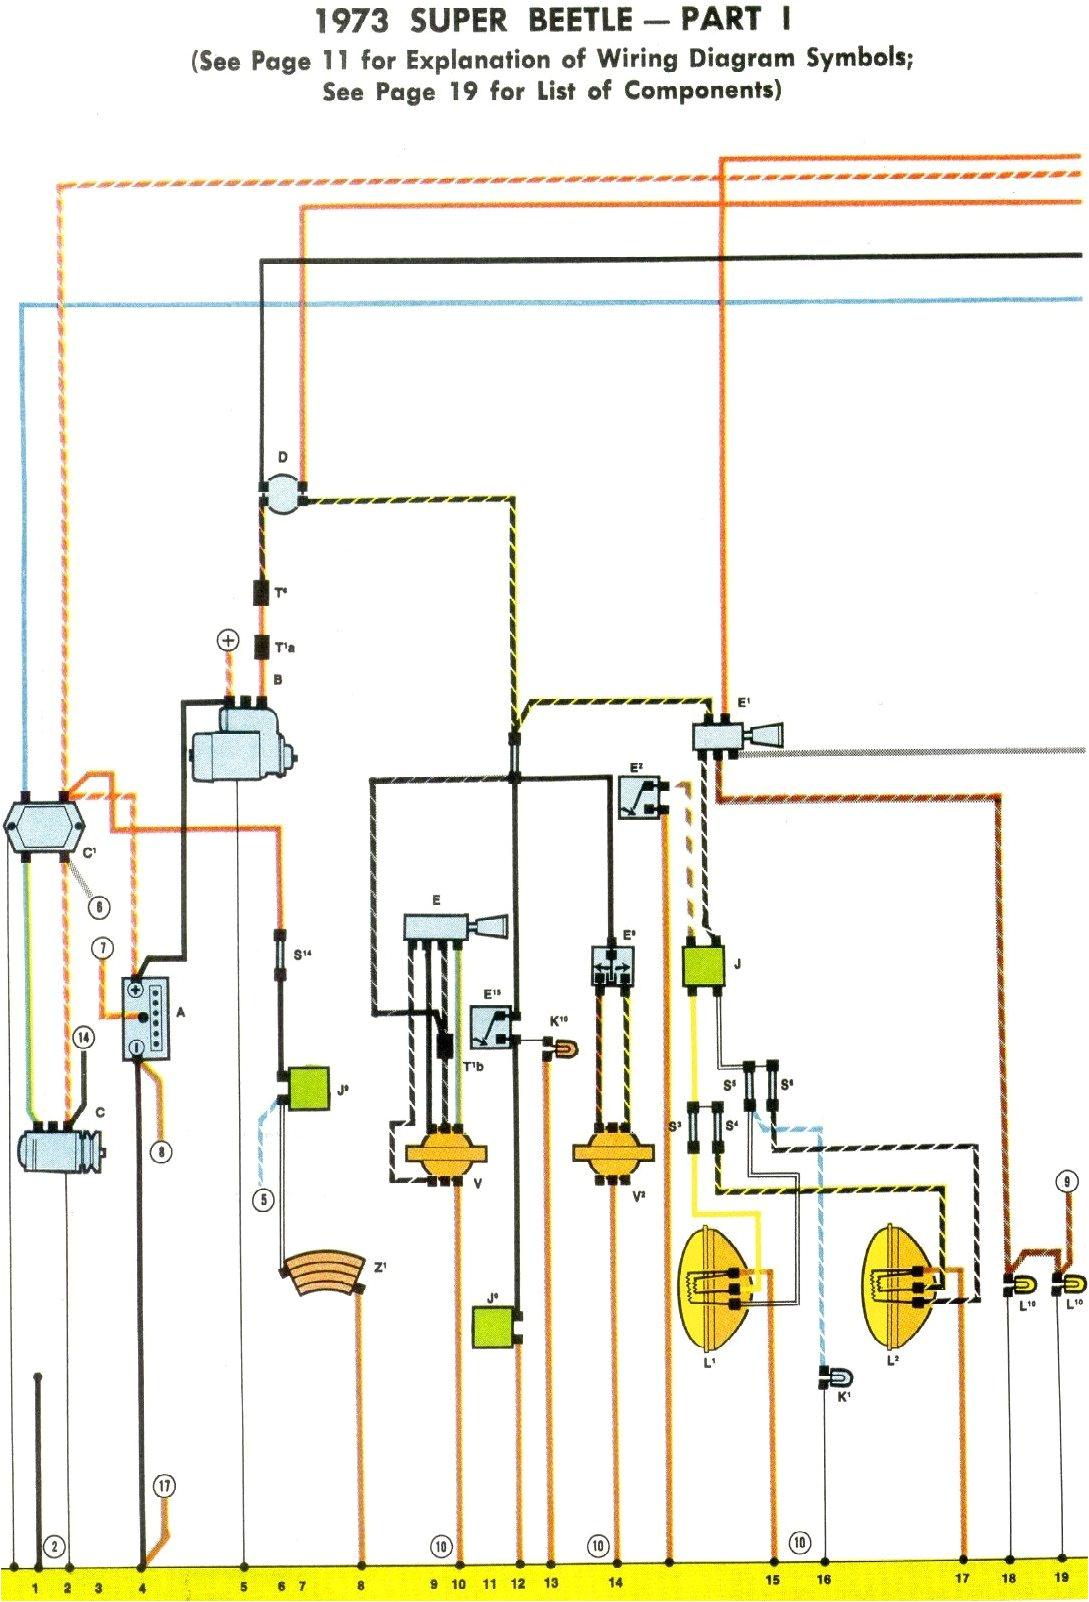 1973 super beetle wiring diagram thegoldenbug com 1973 vw starter wiring diagram 1973 volkswagen wiring diagram